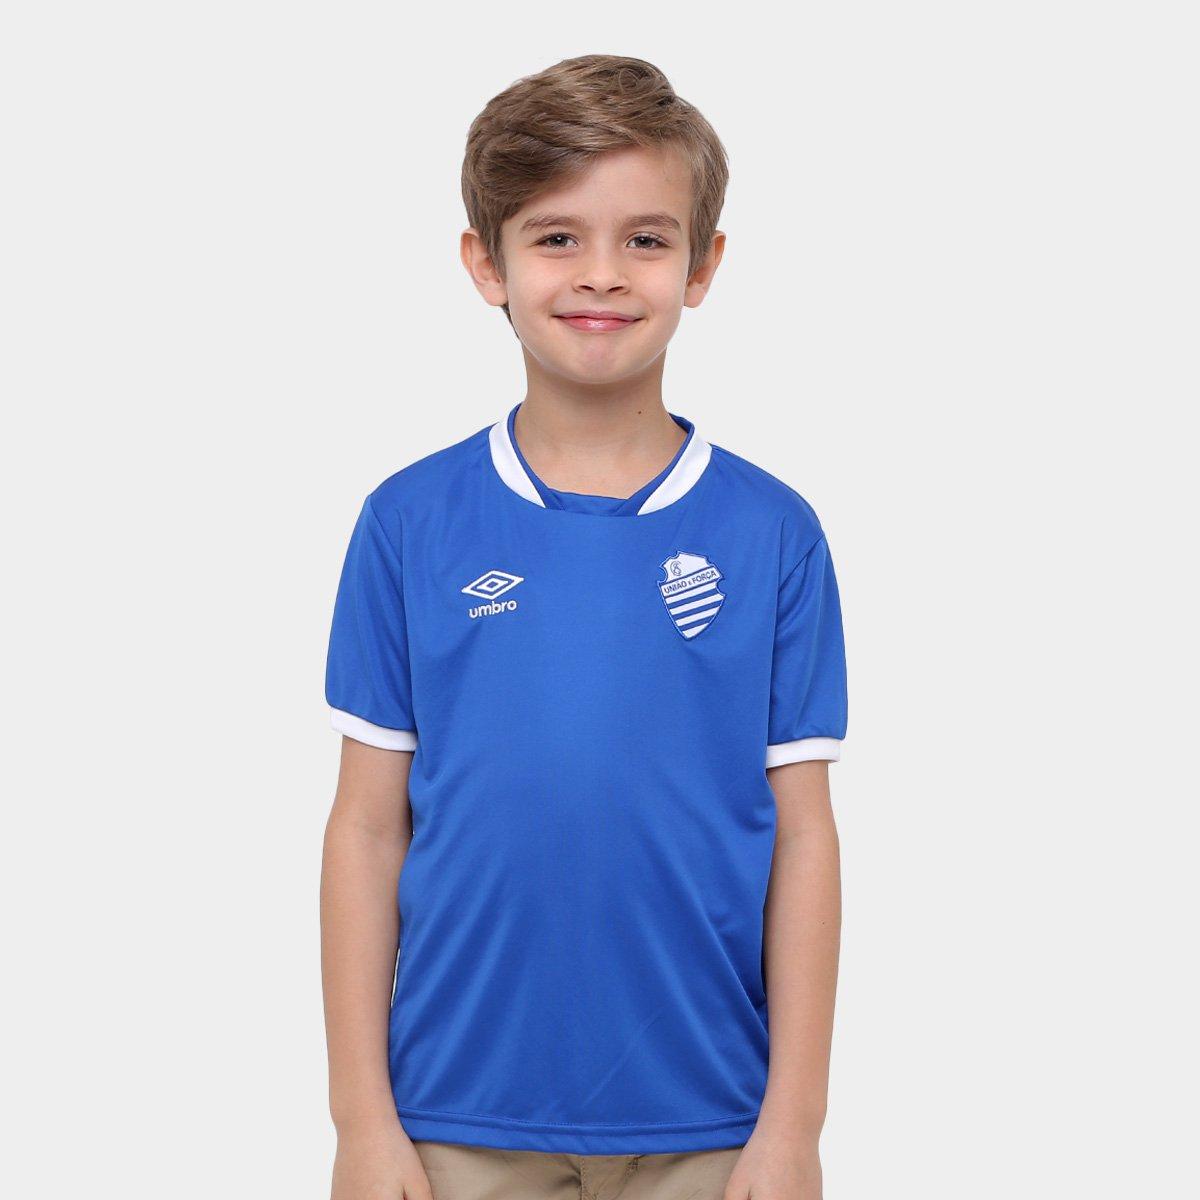 511201a26d Camisa CSA Infantil I 2016 n° 10 - Torcedor Umbro